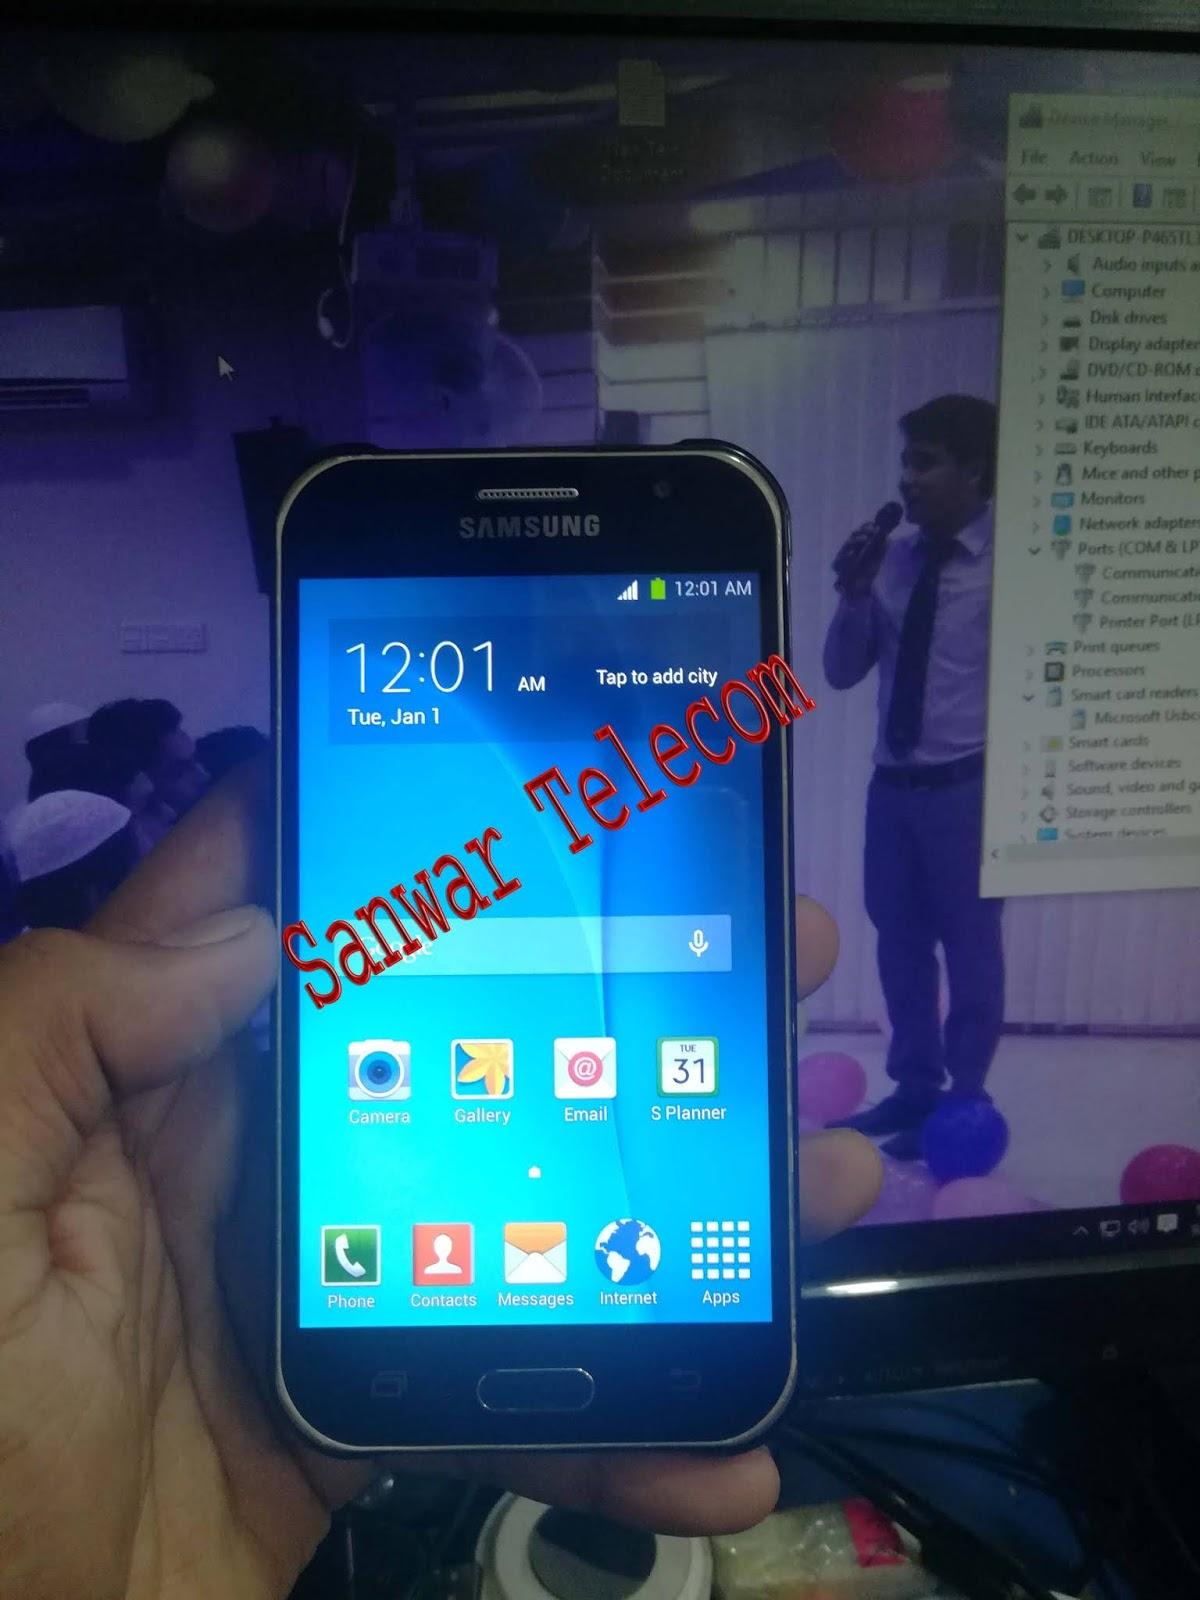 Samsung Copy Firmware Galaxy j1 ace / J110 / J110H Tested